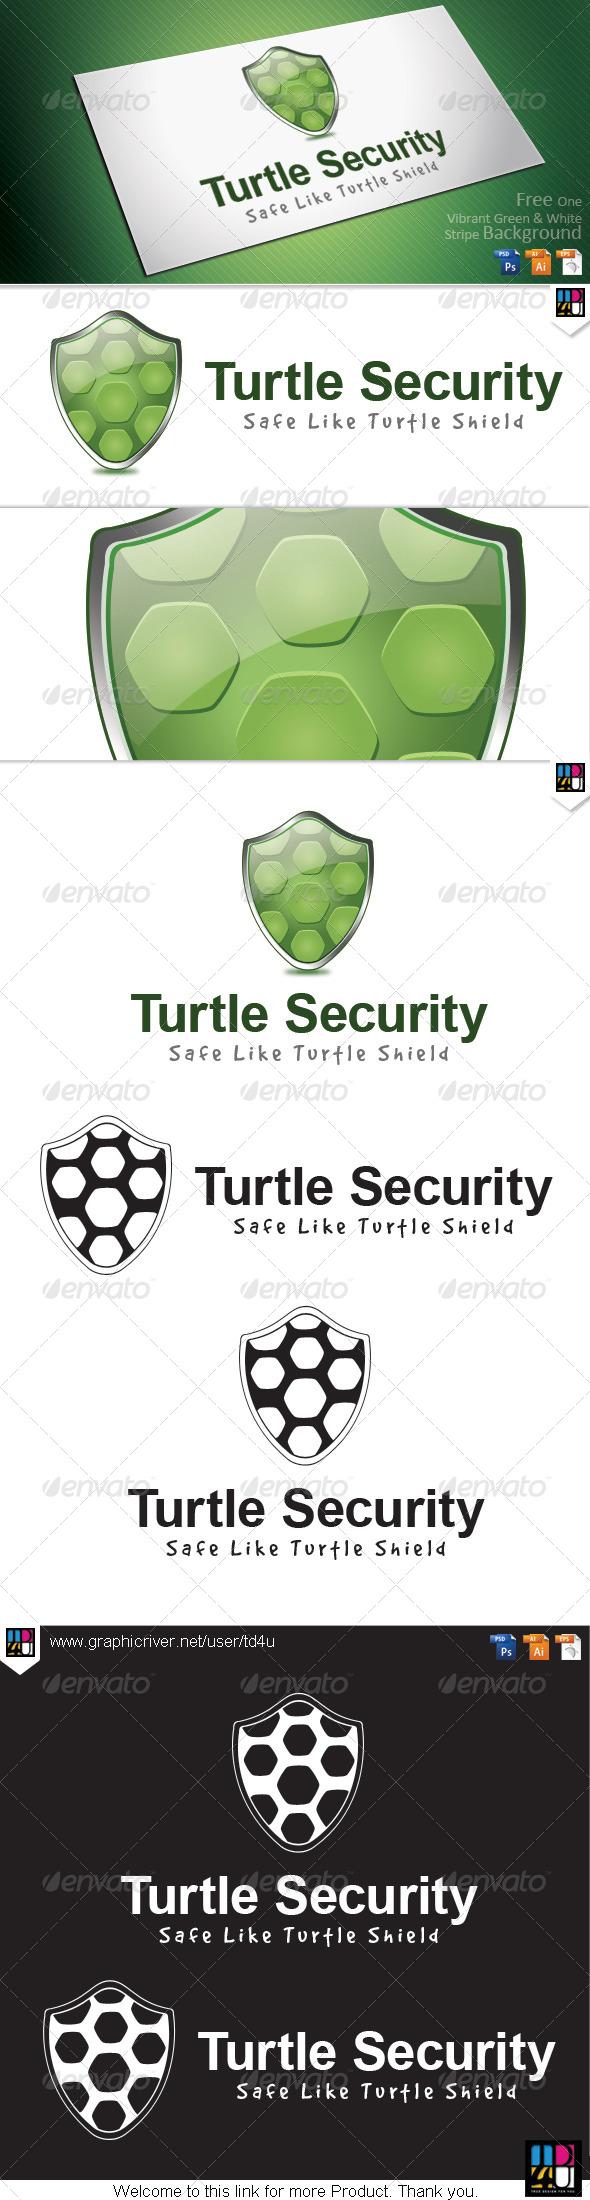 GraphicRiver Turtle Security 4925639